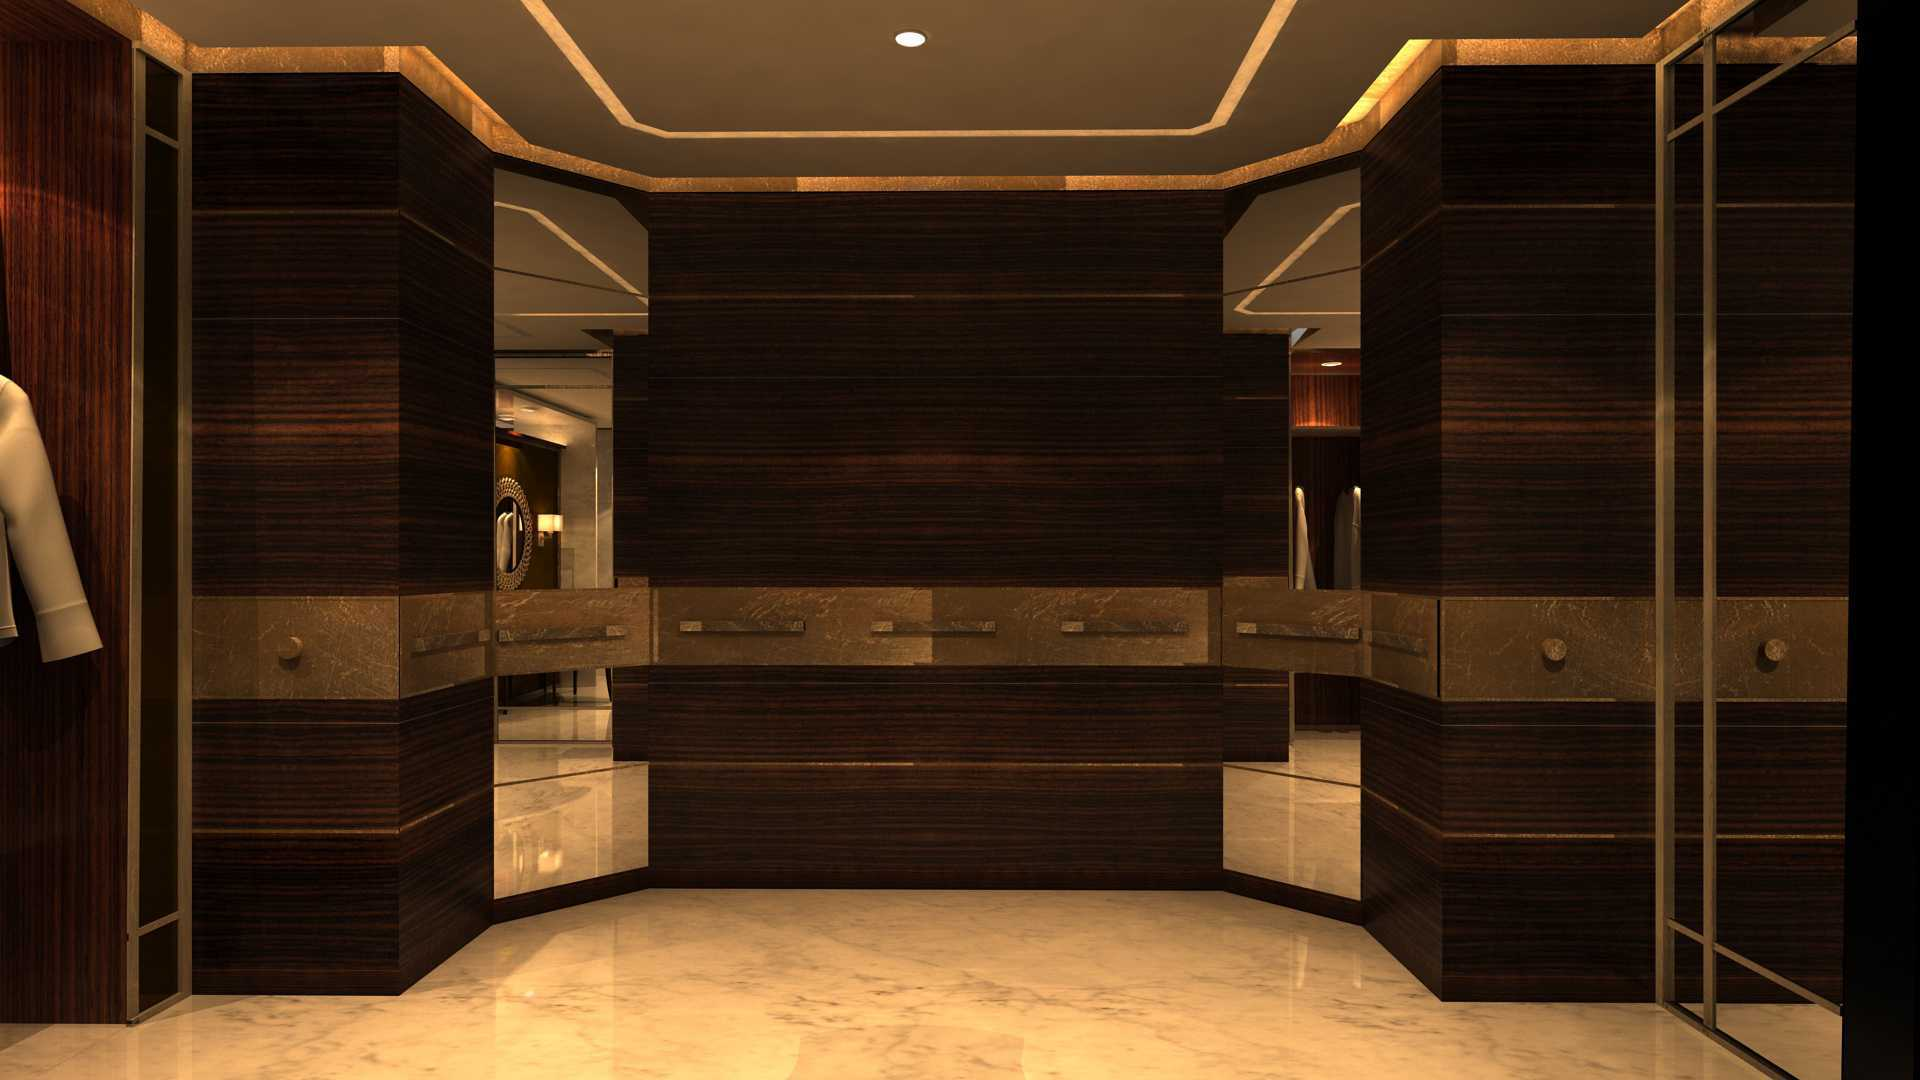 Vin•da•te Mayang Permai Residence Ii - Residential Project (Artist Impression - Construction In Progress) Pantai Indah Kapuk - North Jakarta Pantai Indah Kapuk - North Jakarta Lt Kontemporer  17230